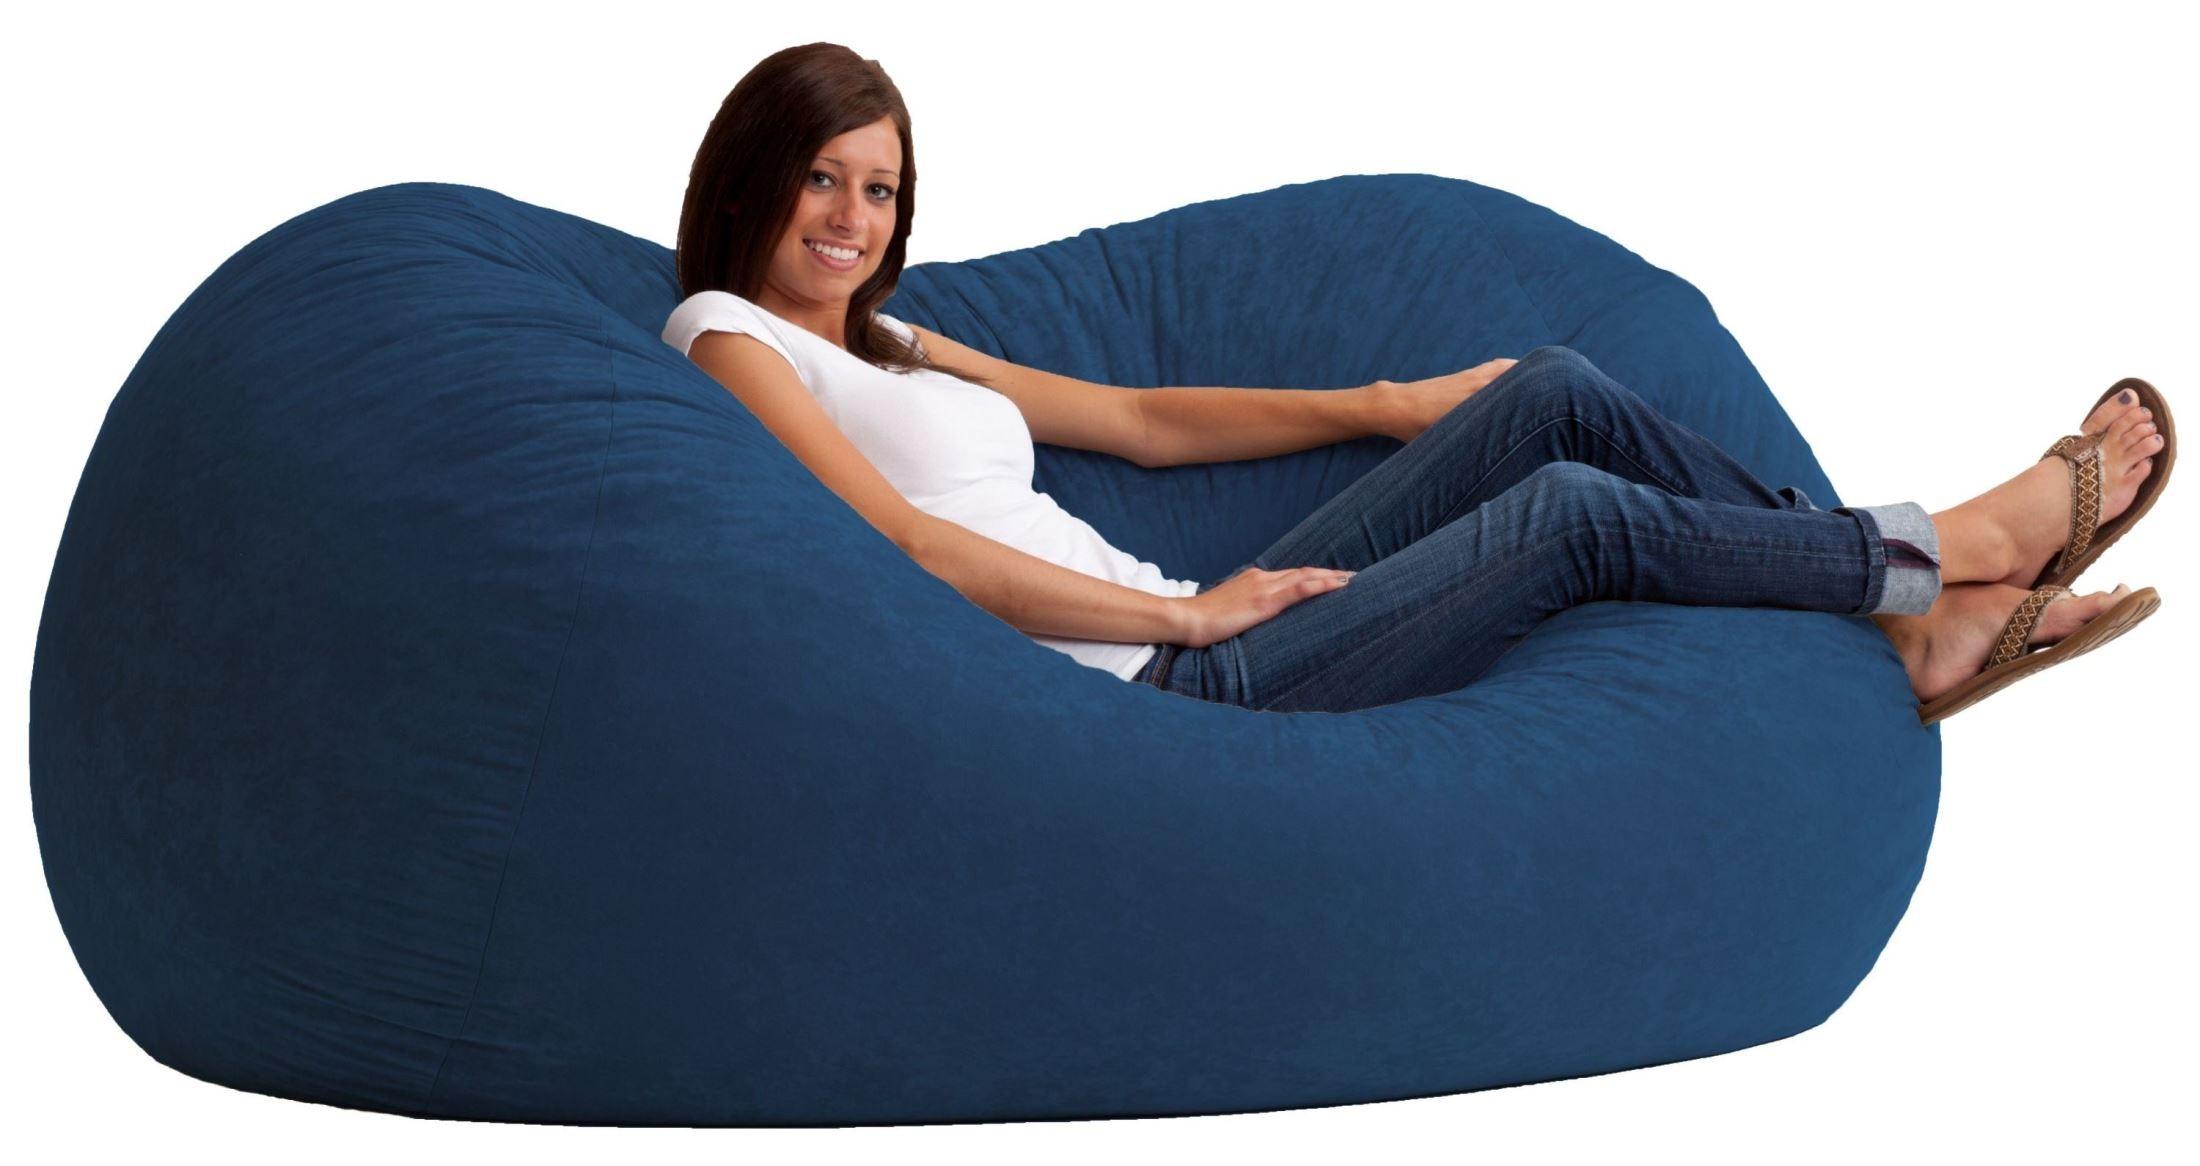 Big Joe Xl Fuf Blue Sky Suede Comfort Bean Bag From